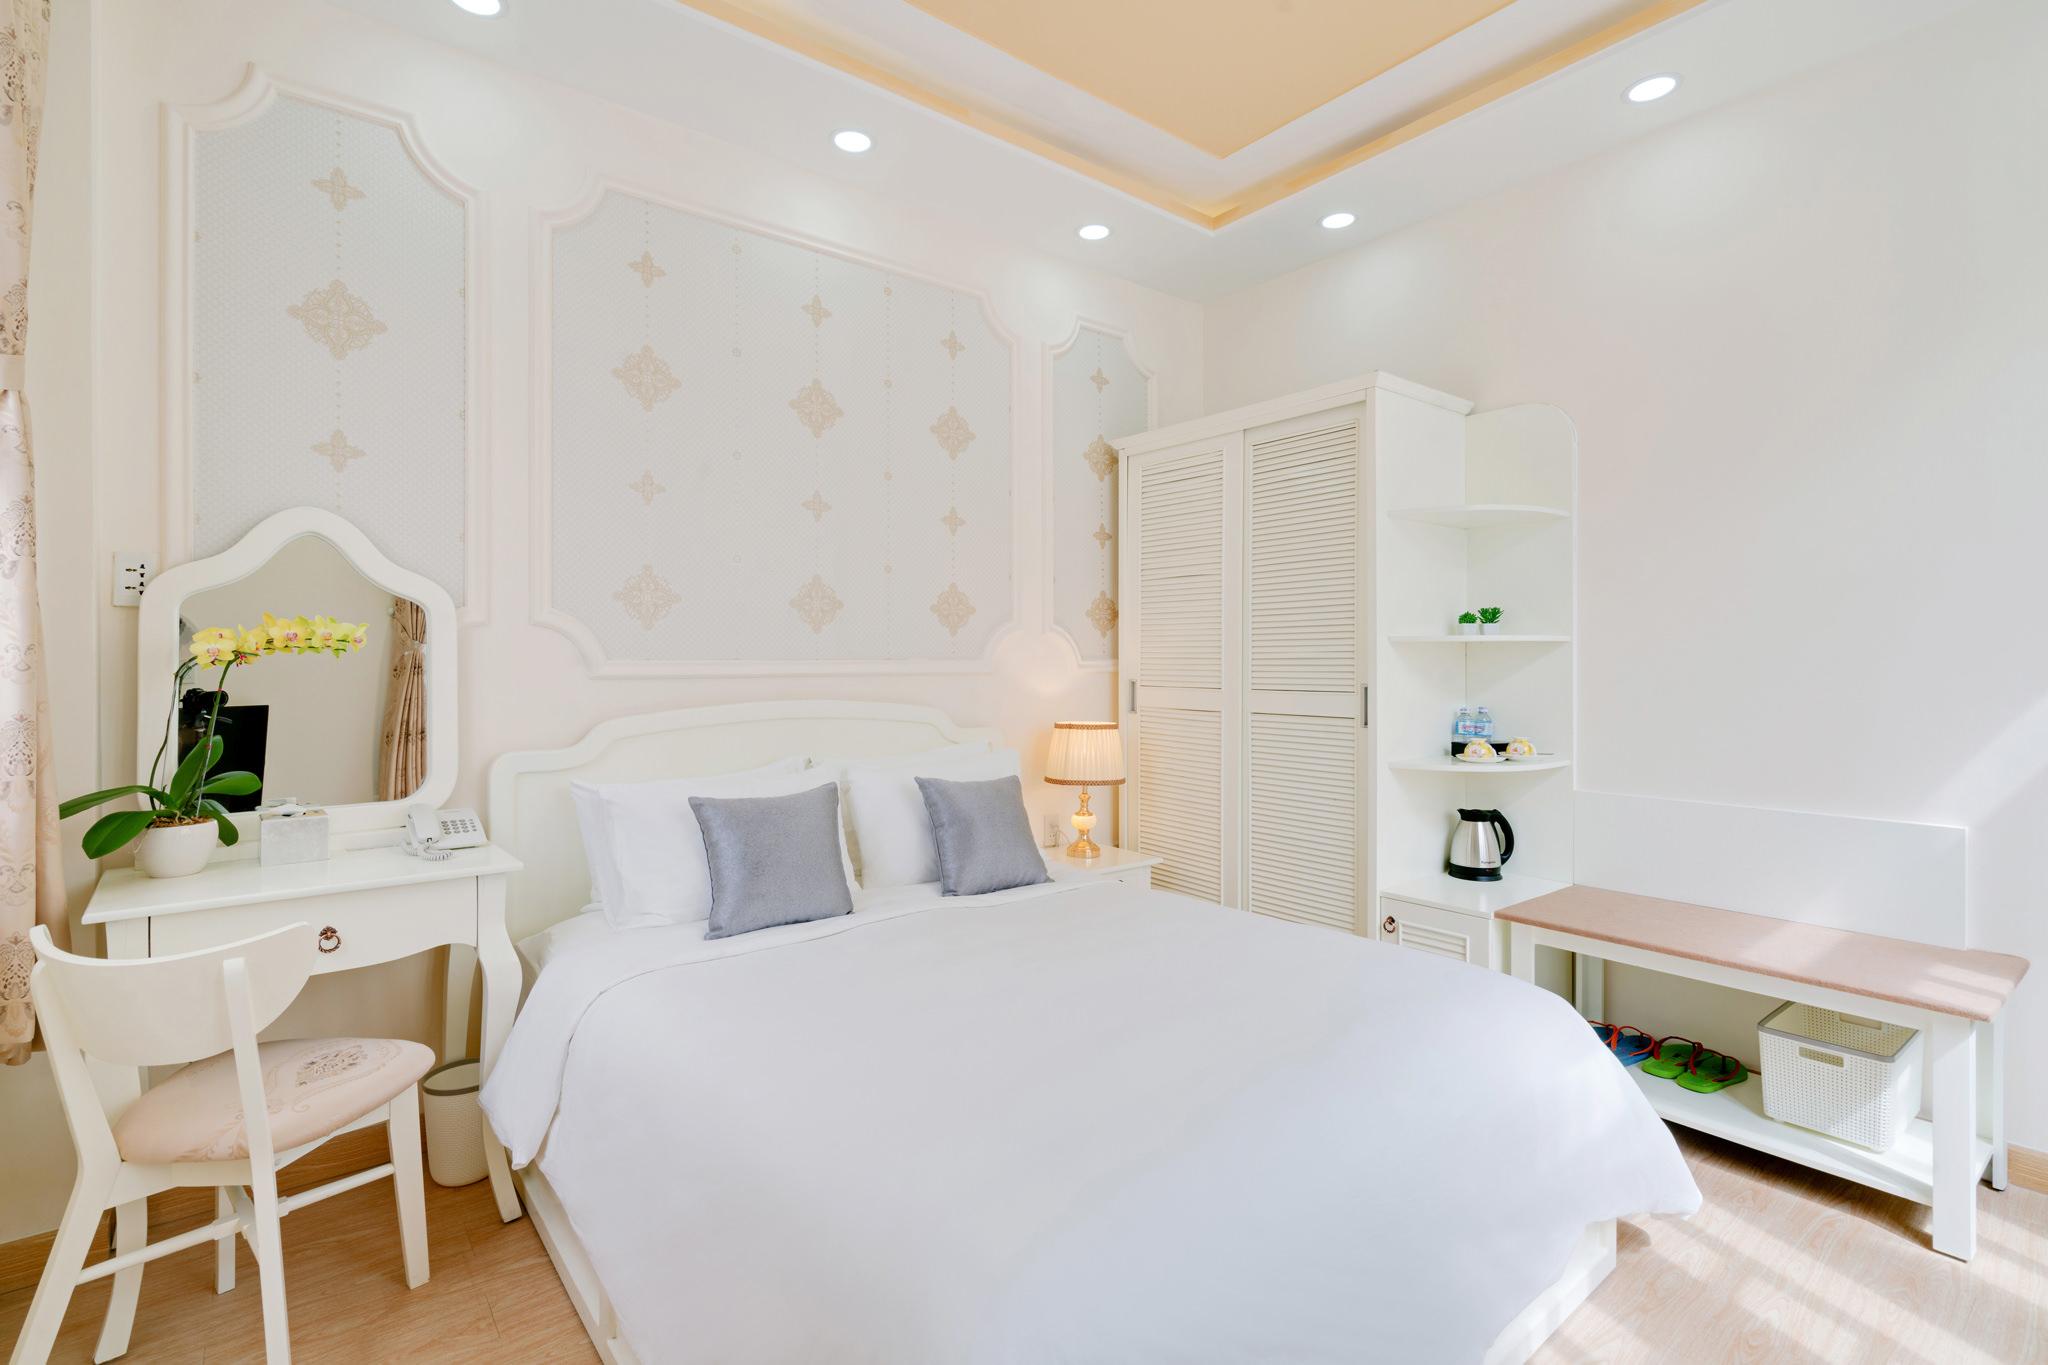 20180529 - Chez Mimosa - Interior - Hotel - 007.jpg